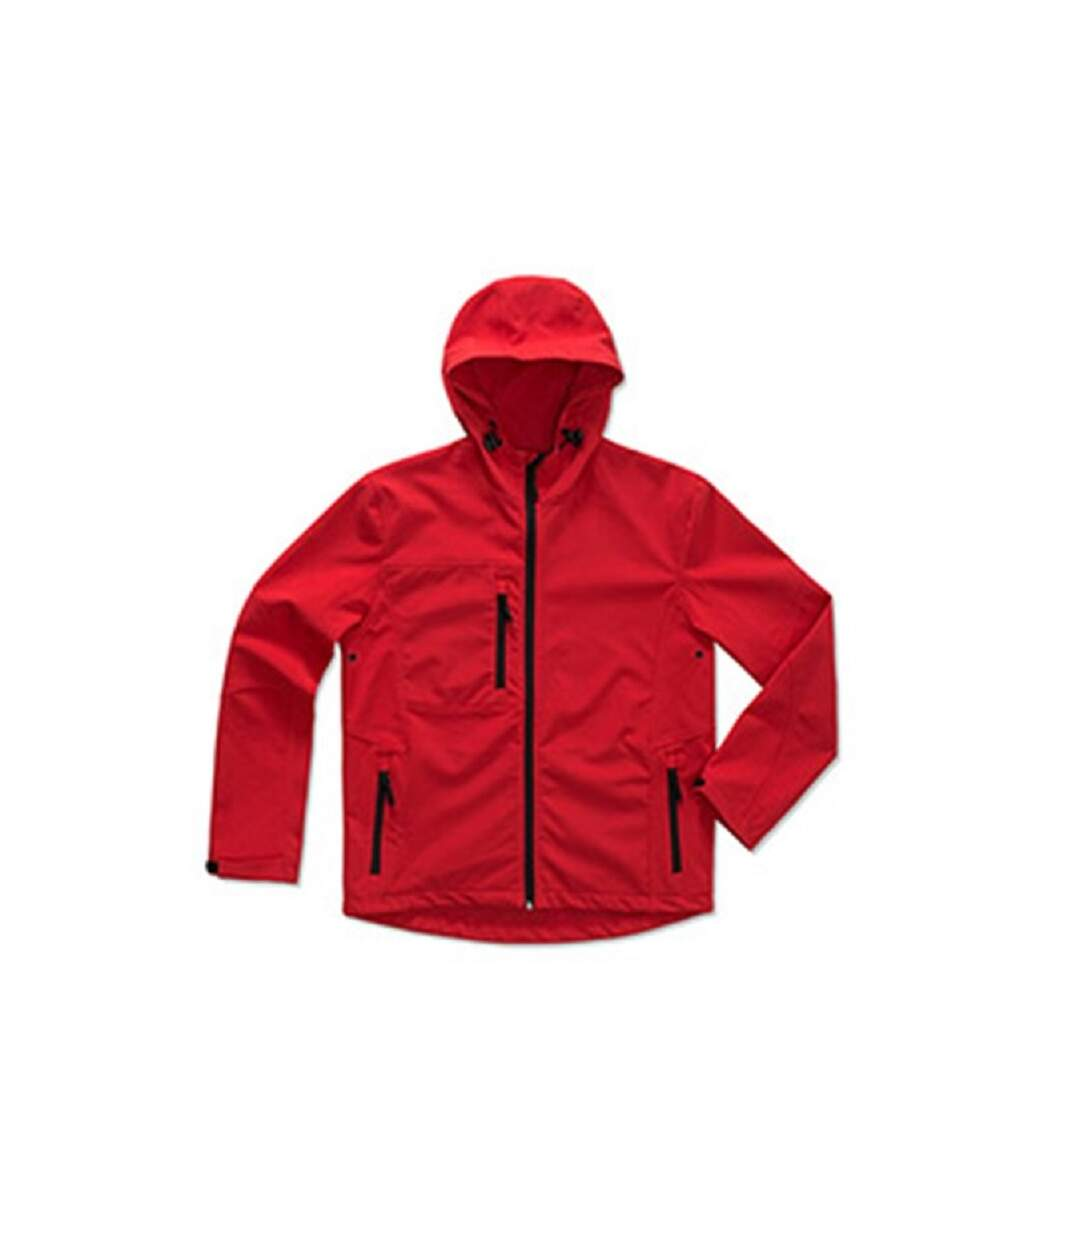 Stedman Mens Active Softest Shell Hooded Jacket (Crimson Red) - UTAB308